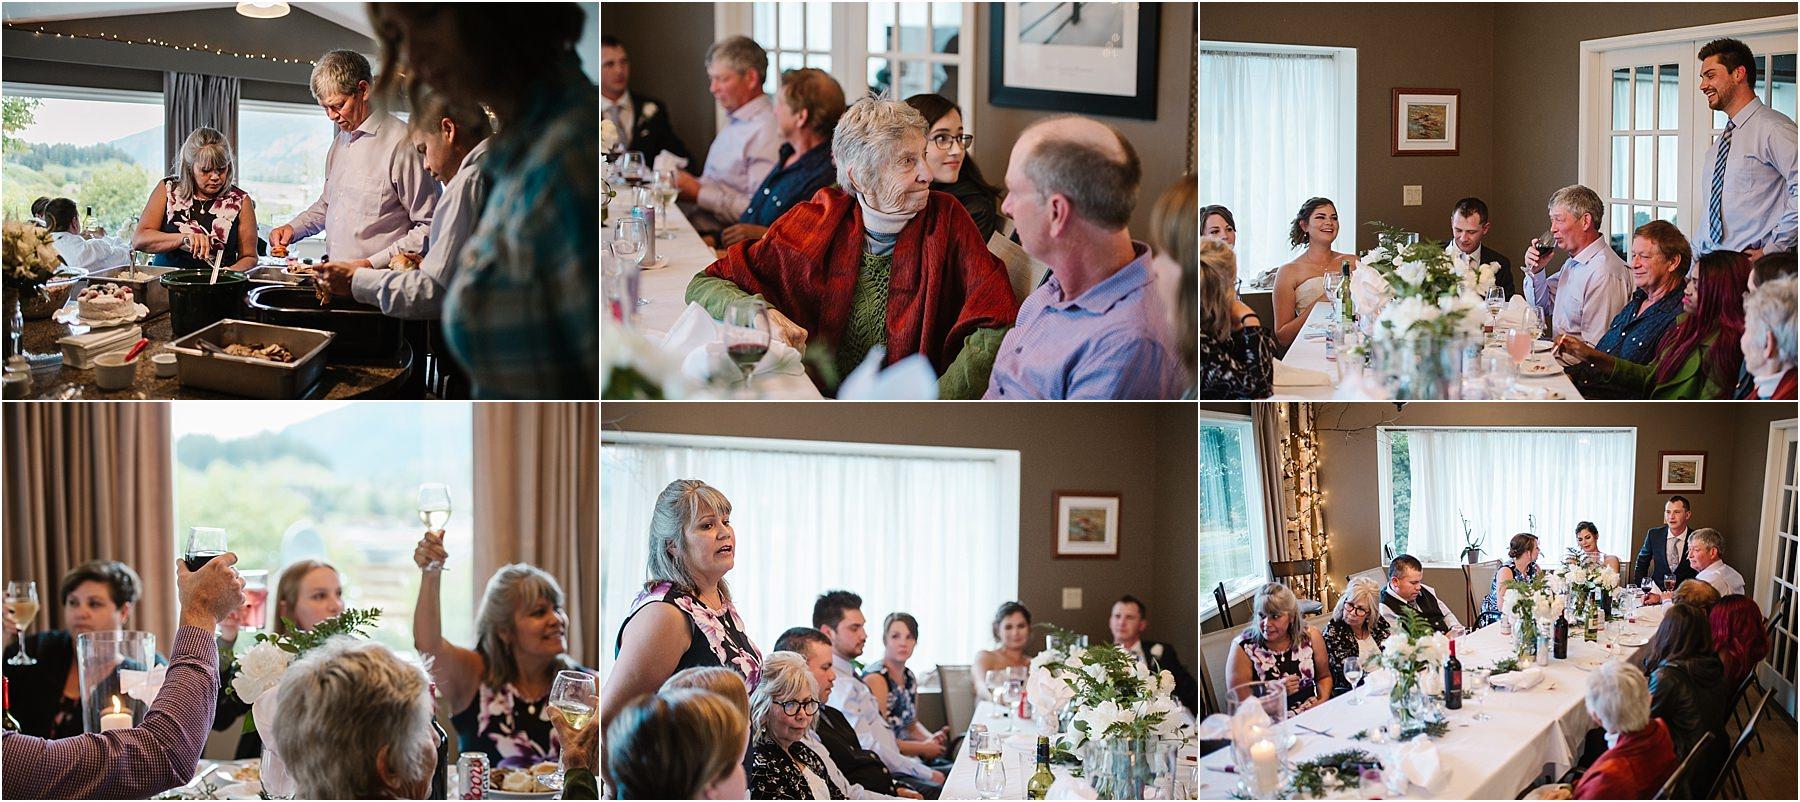 Barriere wedding photographer details detail shot reception venue ideas dinner family